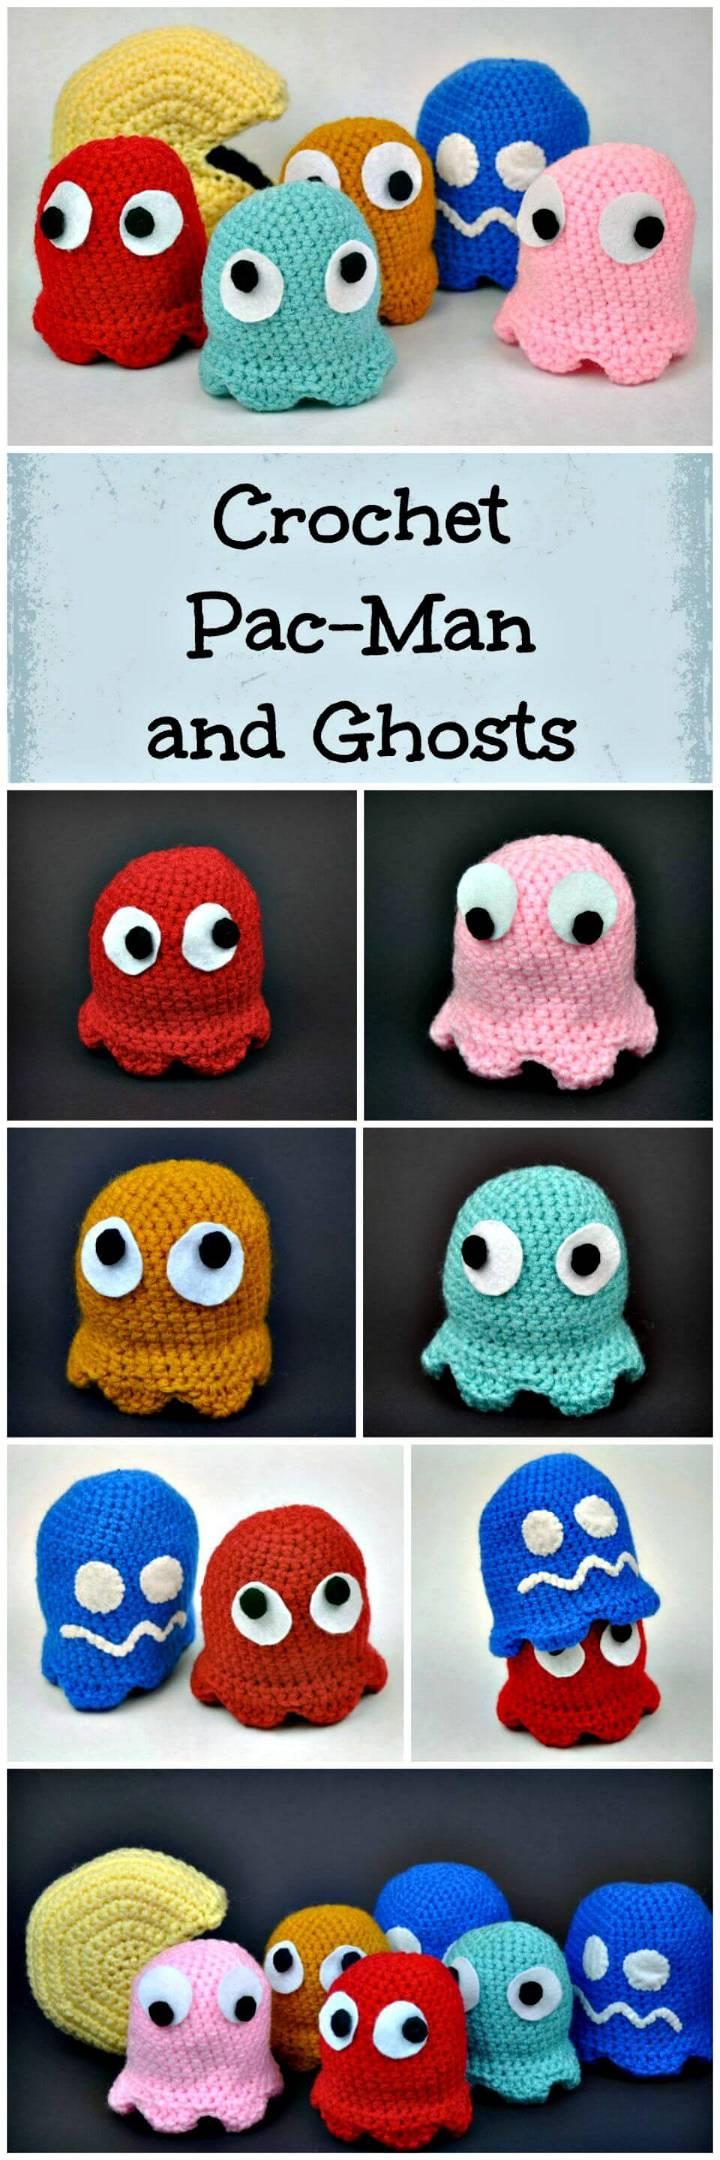 Crochet Pac-Man and Ghosts Amigurumi Pattern